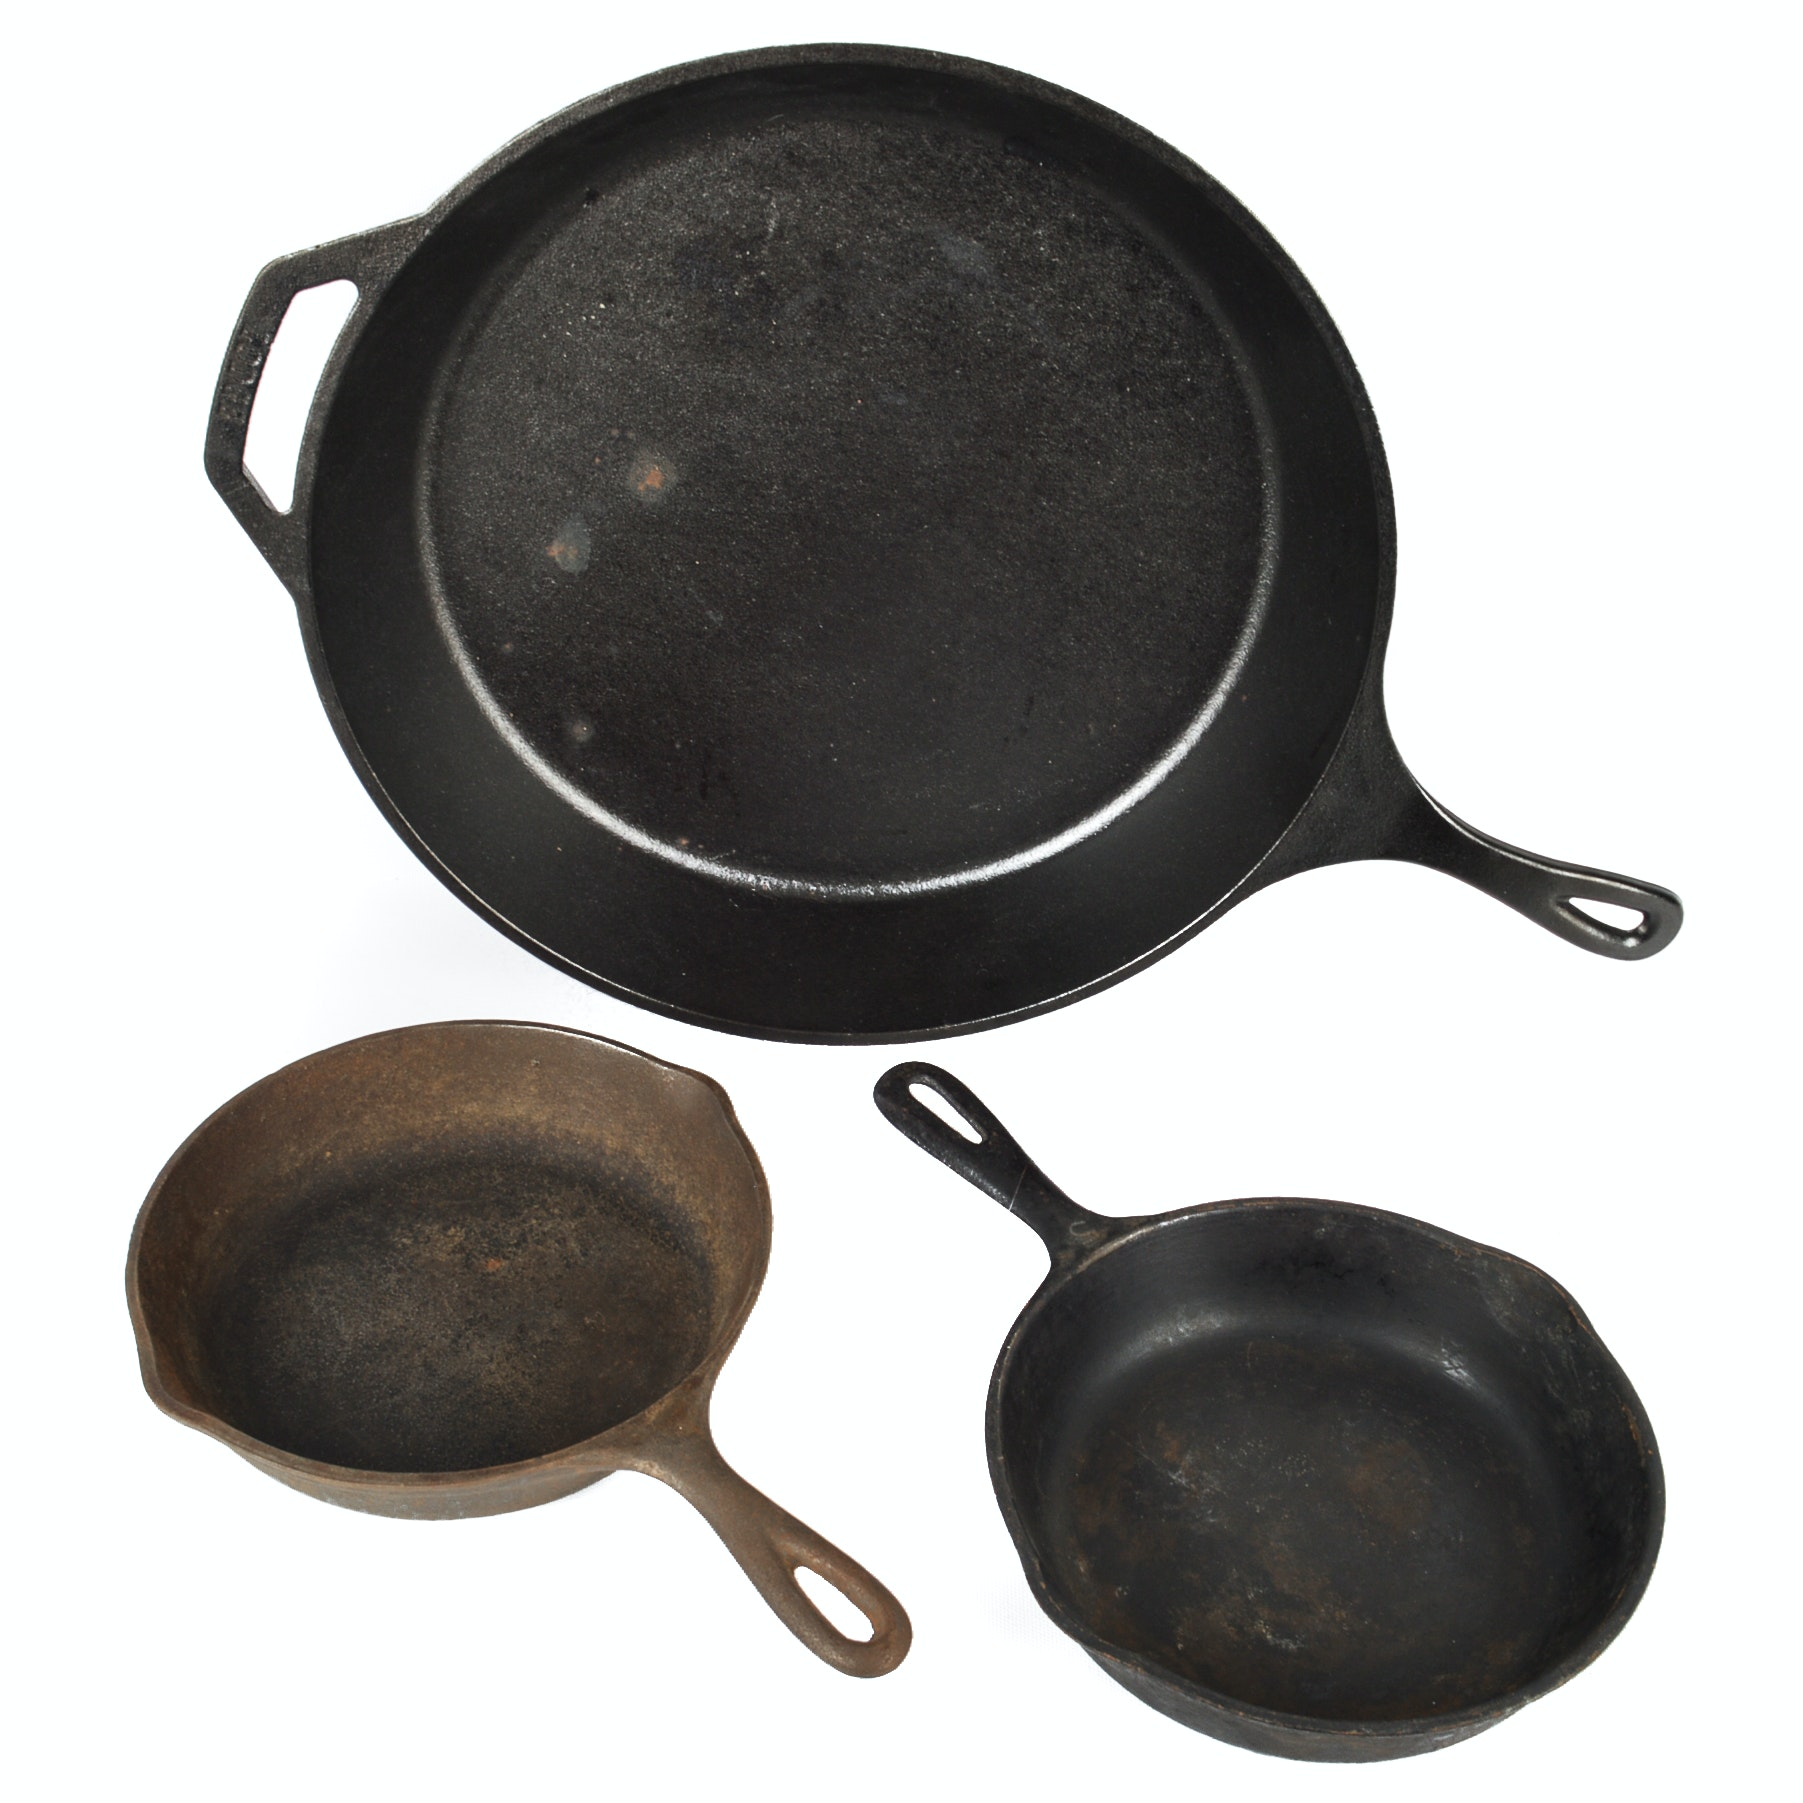 Three Cast Iron Skillets